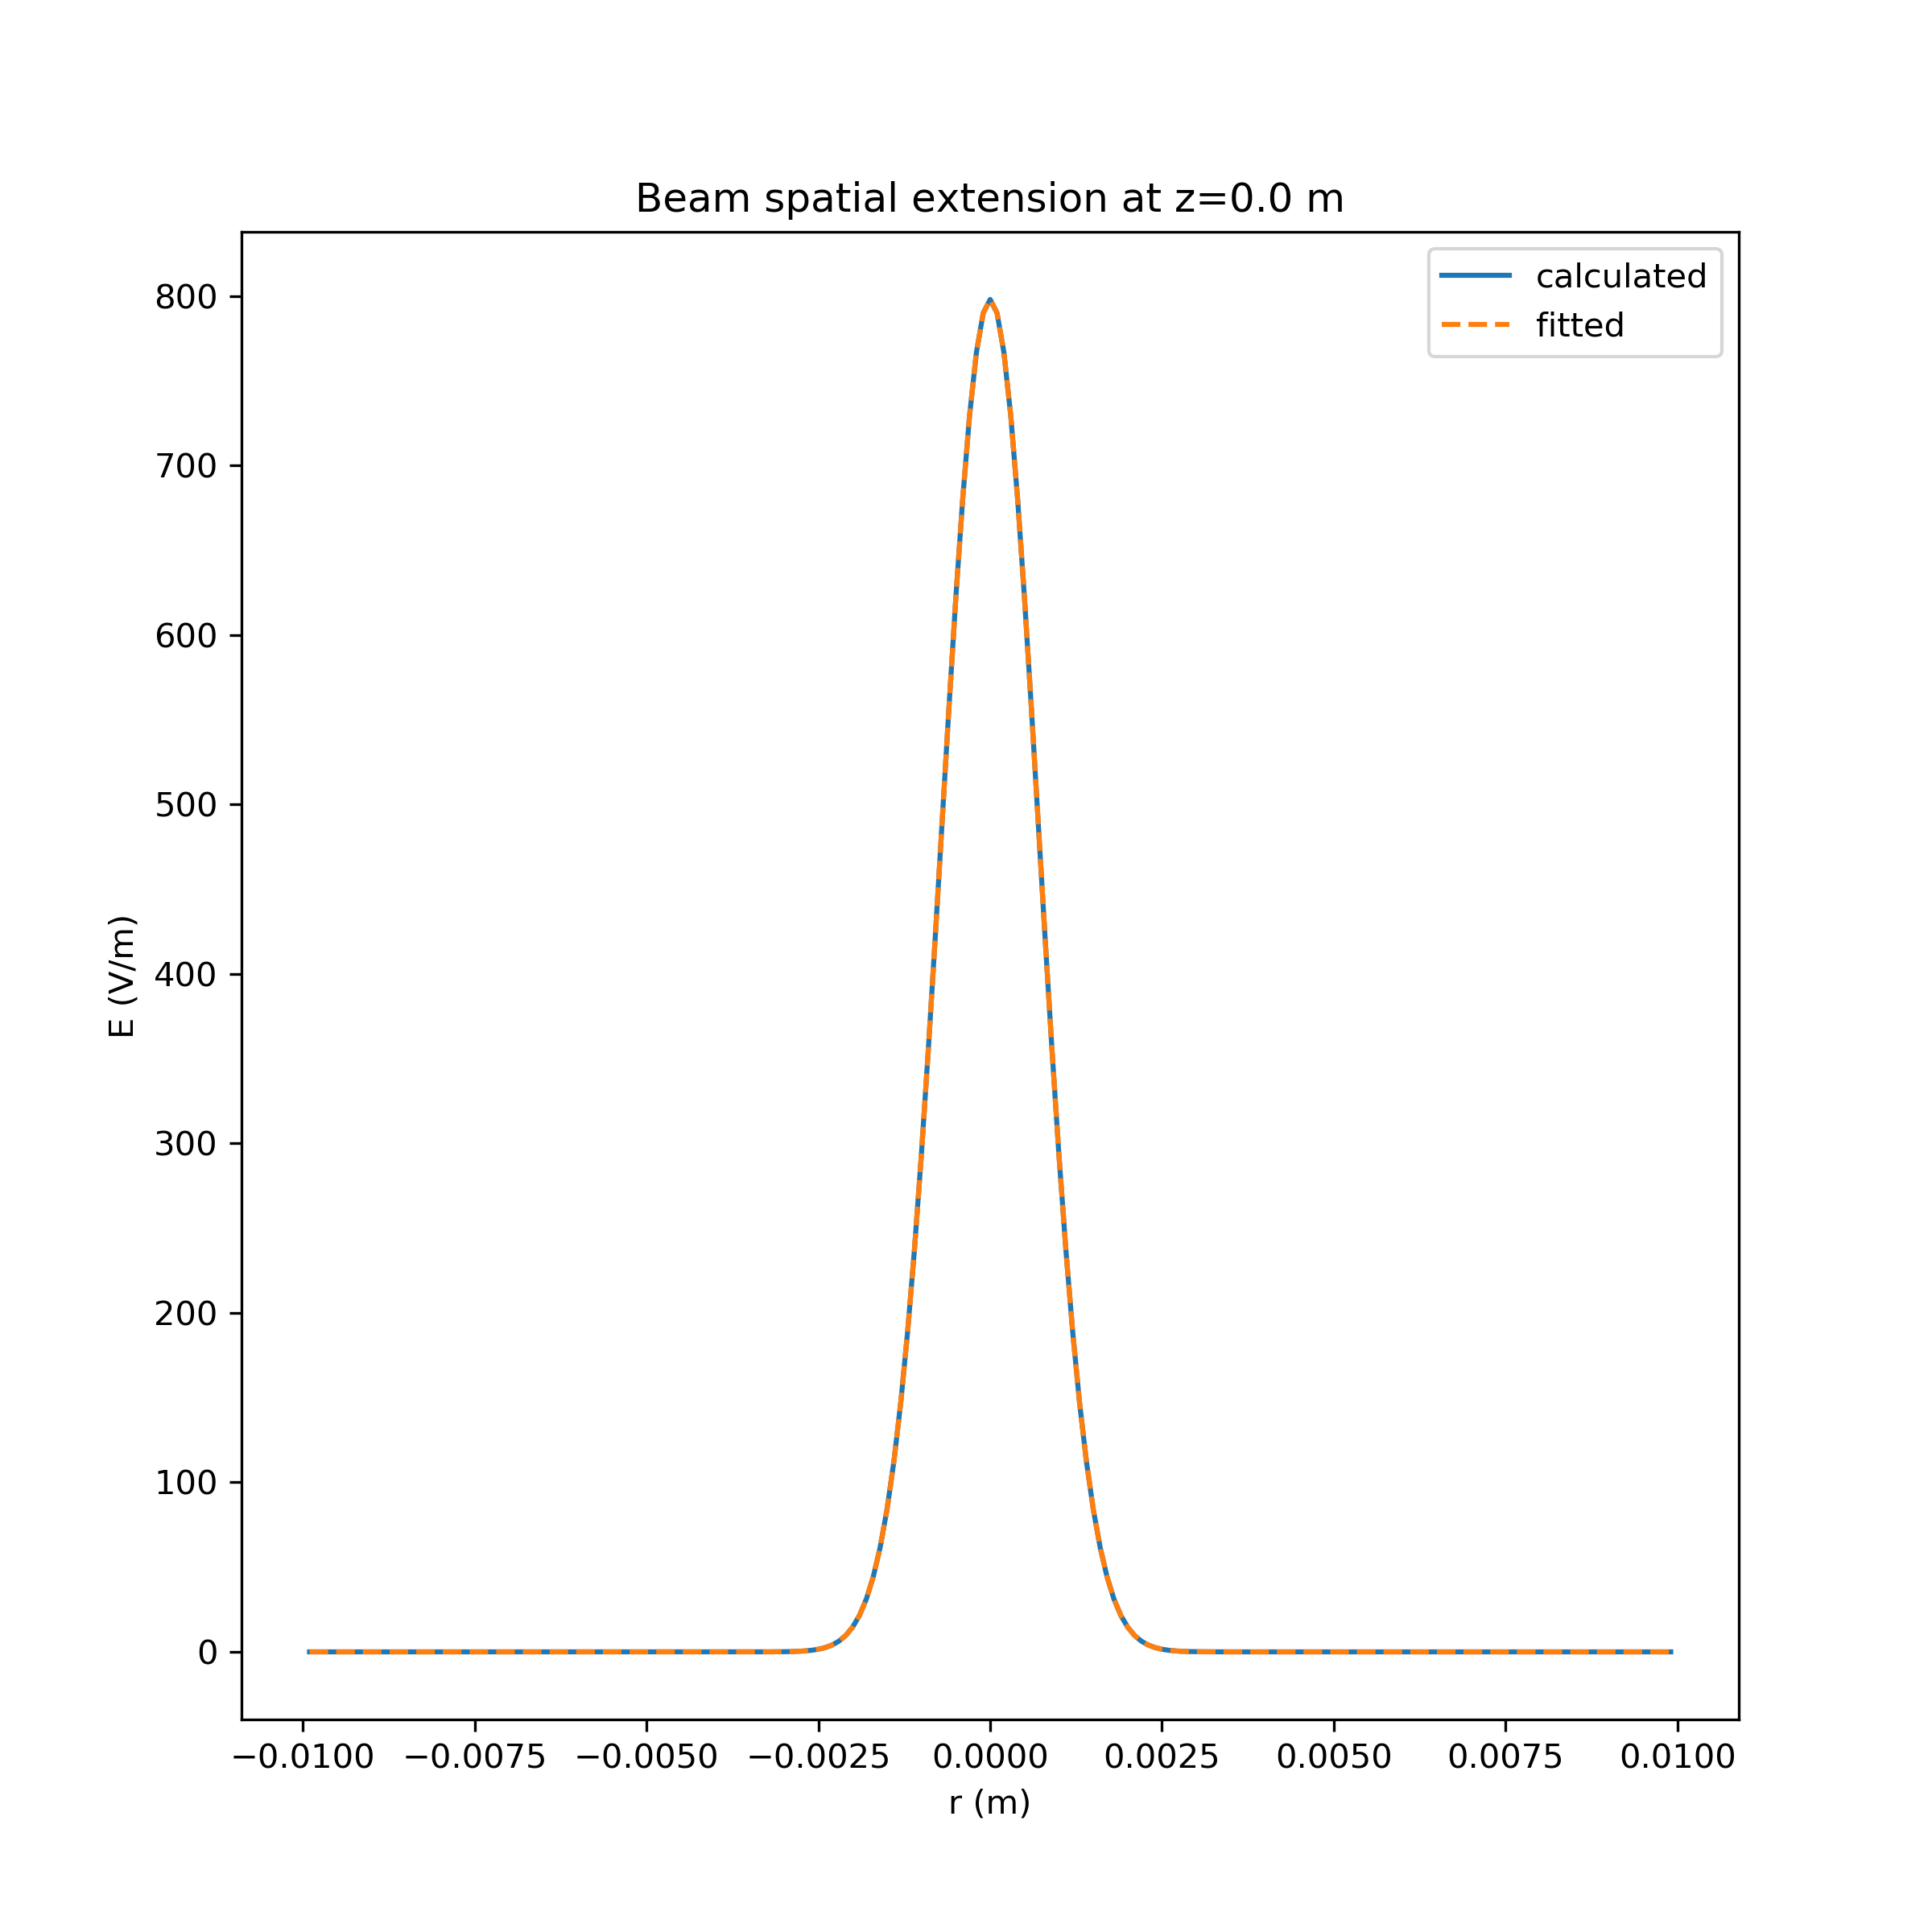 figures/HSCN/spatial_fit_init.png